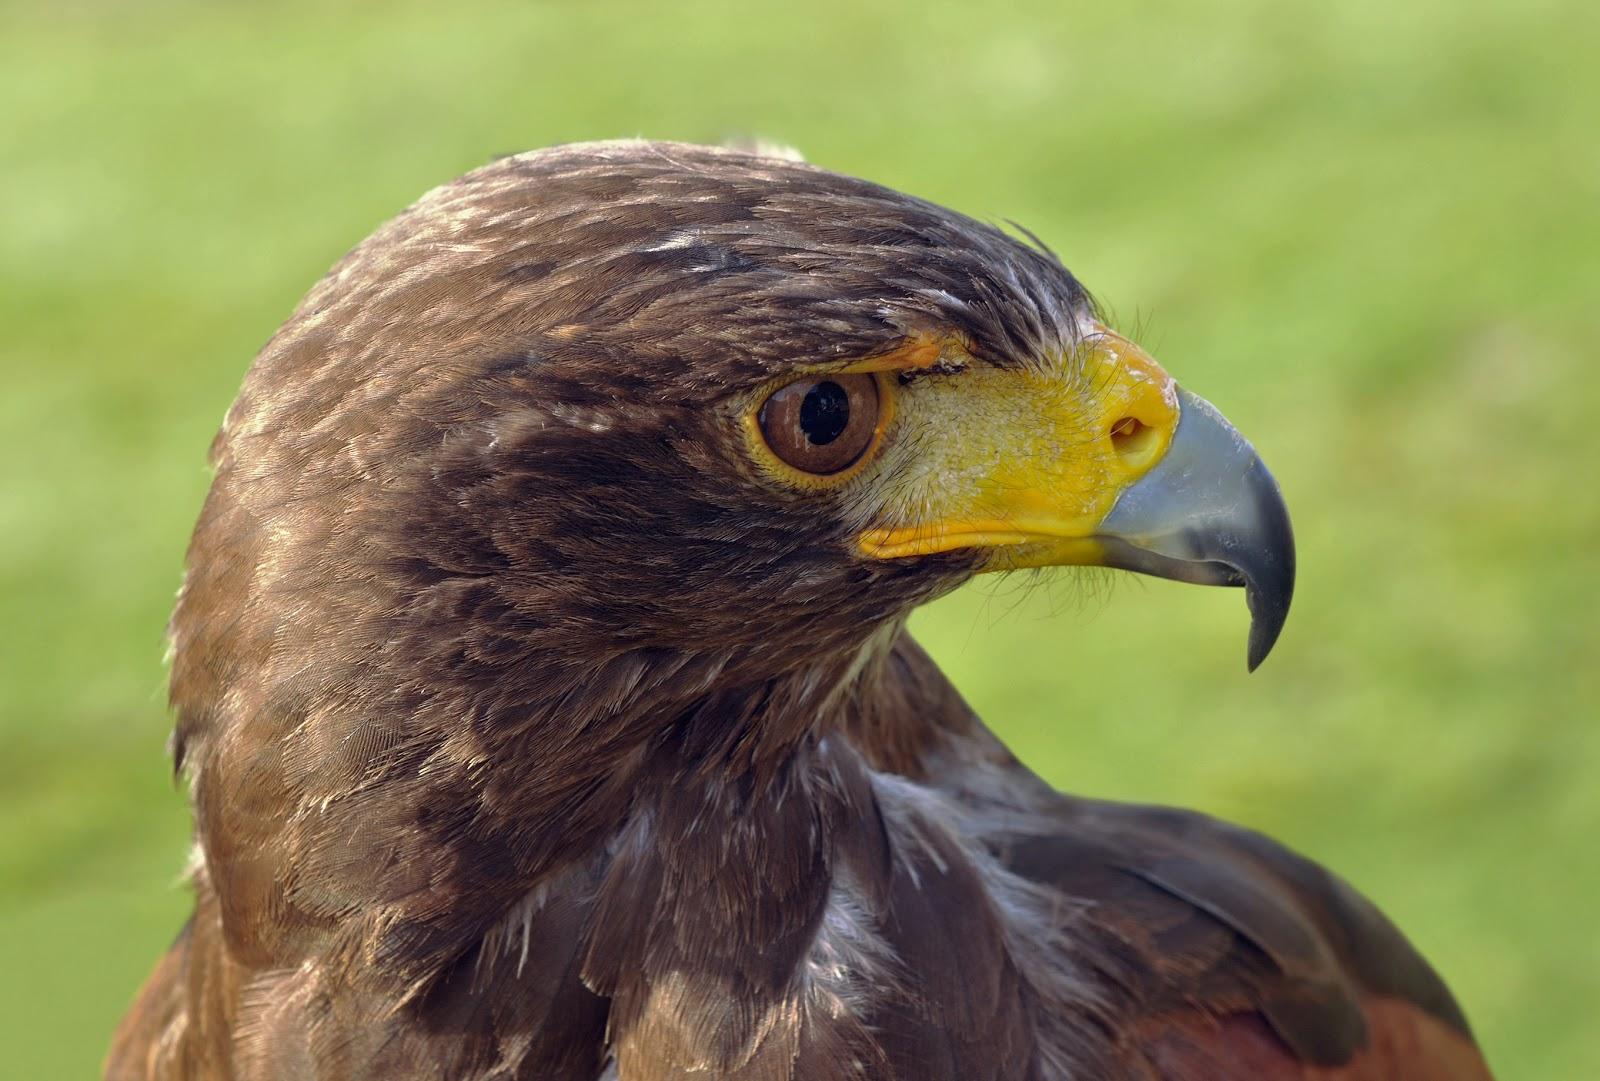 Harris's_Hawk_Parabuteo_unicinctus_(Temminck_1824).jpg